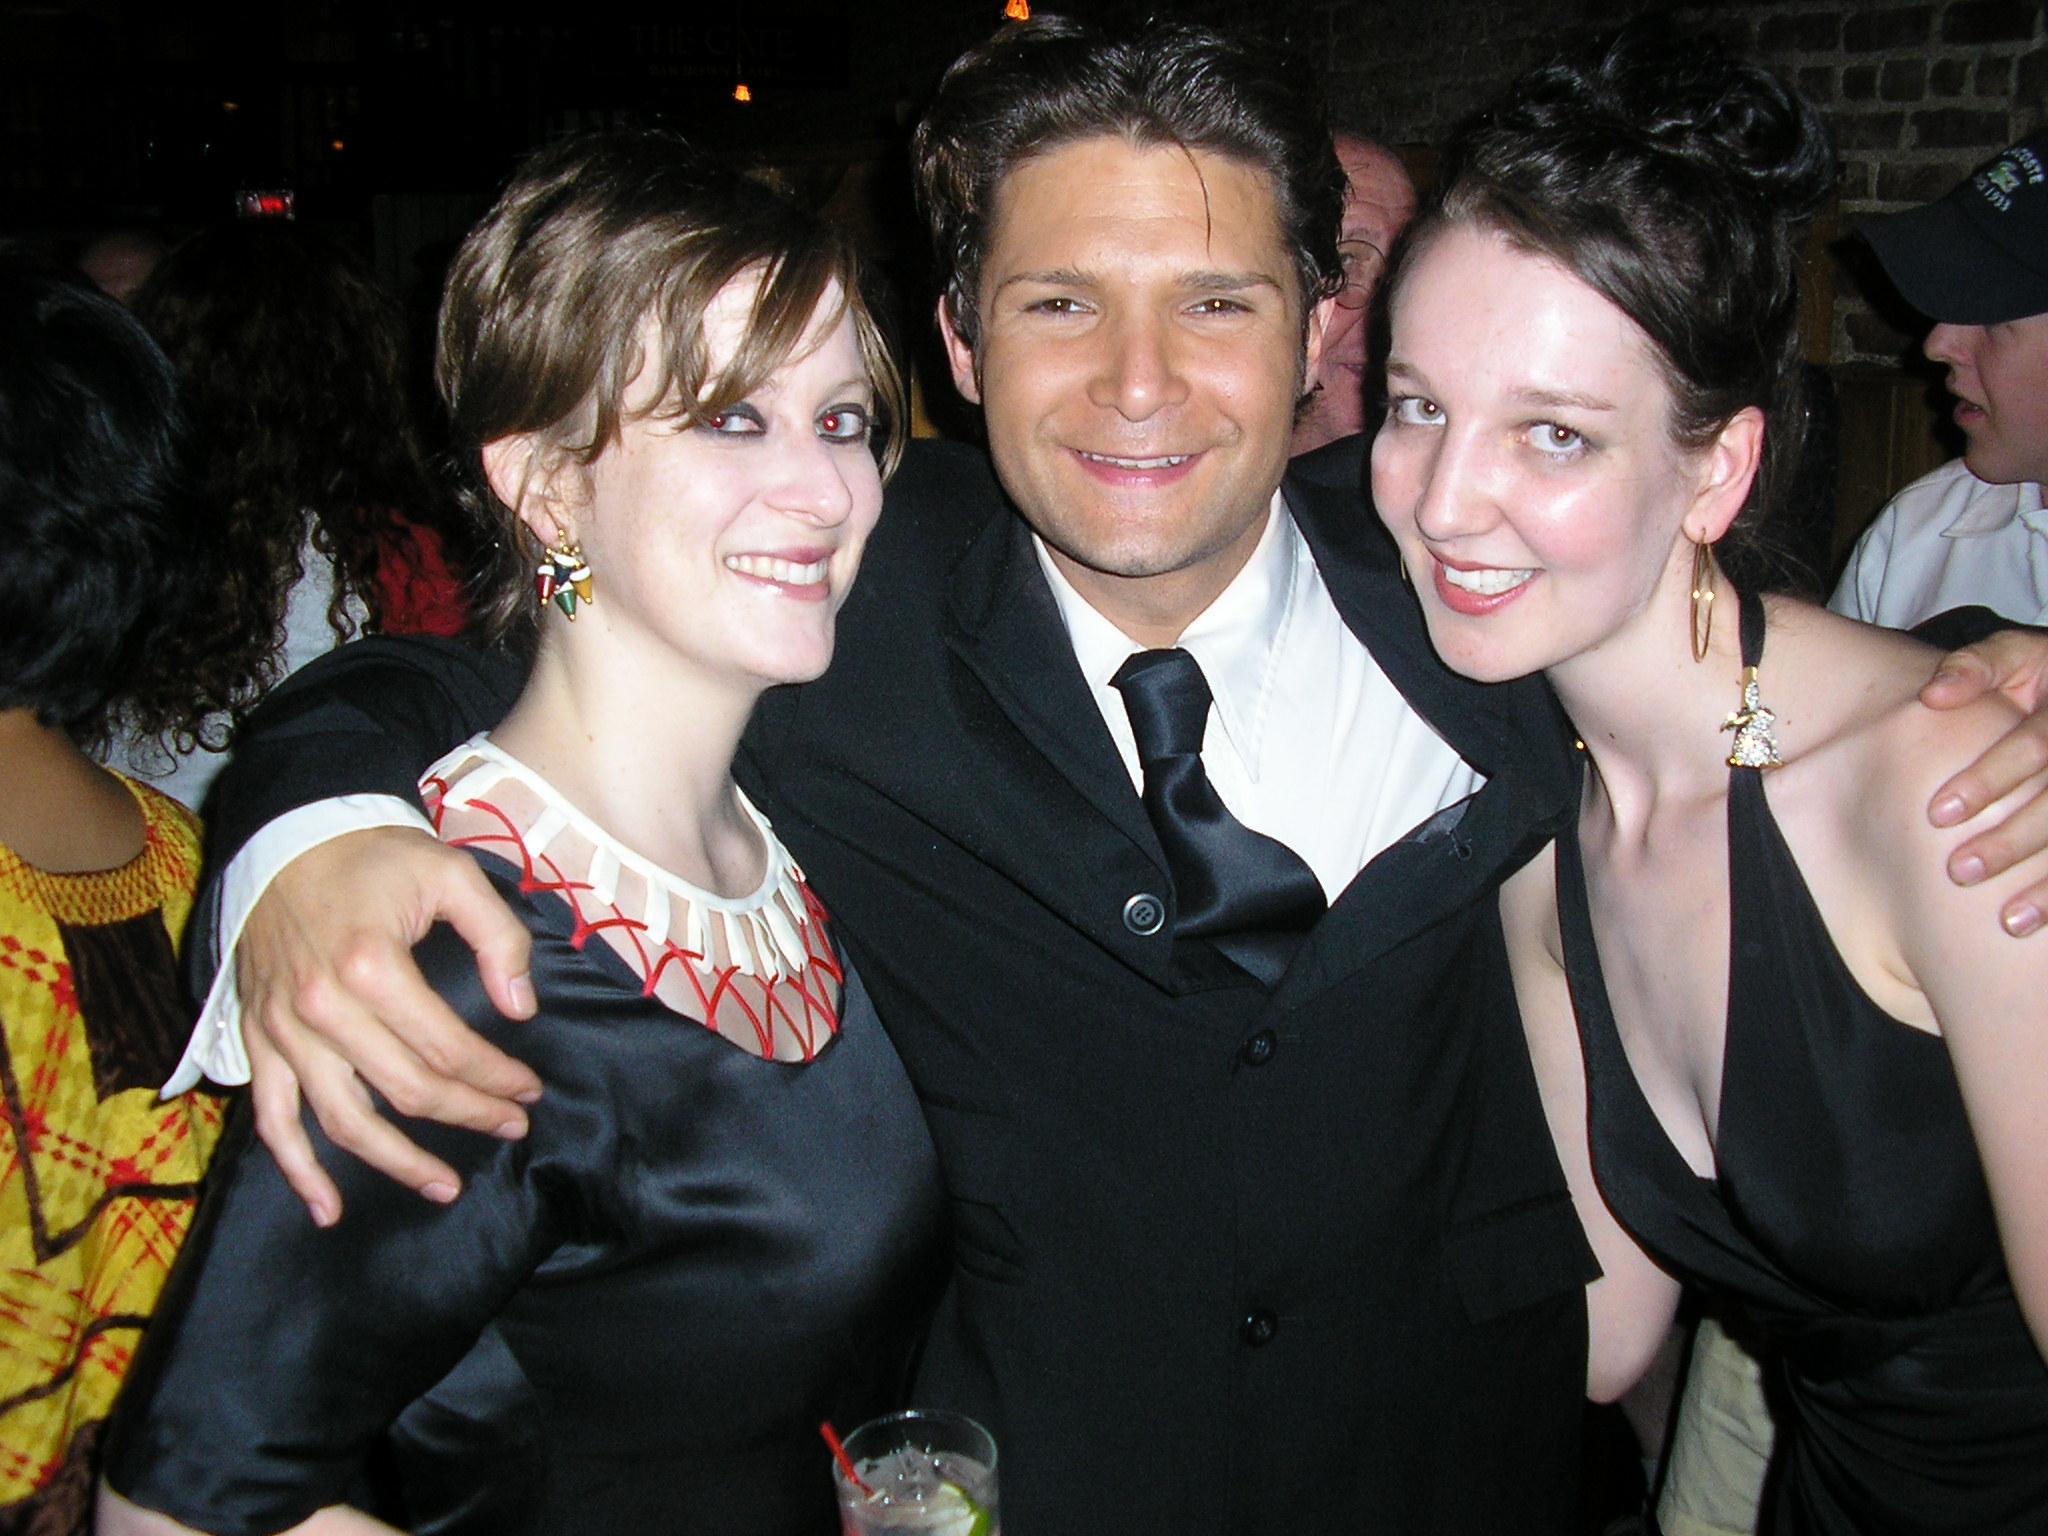 FA opening - Alana, Corey, Kate.jpg